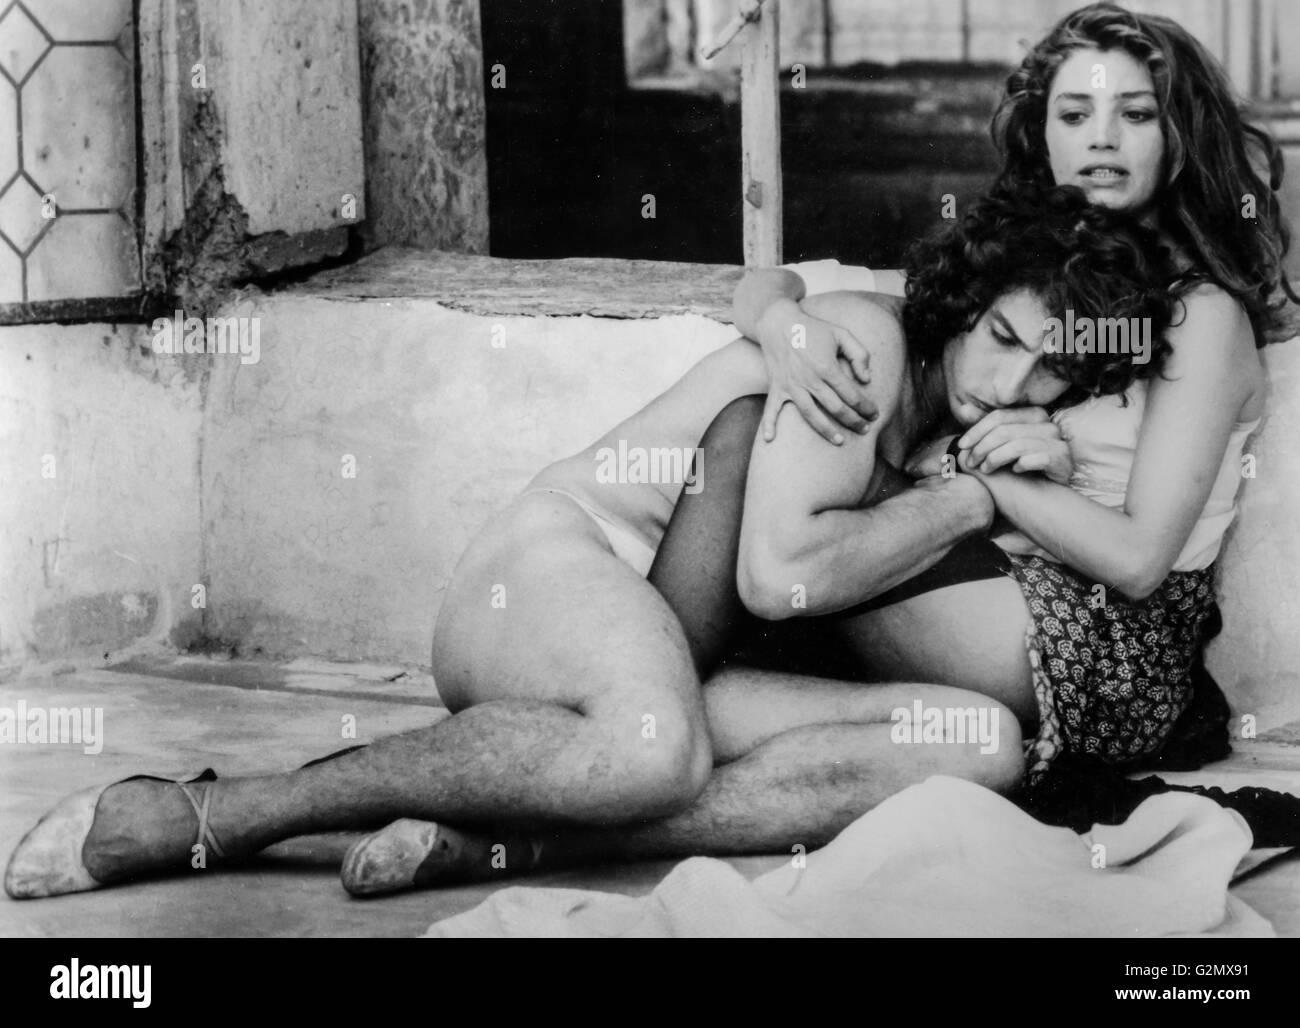 Daniel Ezralow, Angela Molina in Camorra, 1985 Stockbild